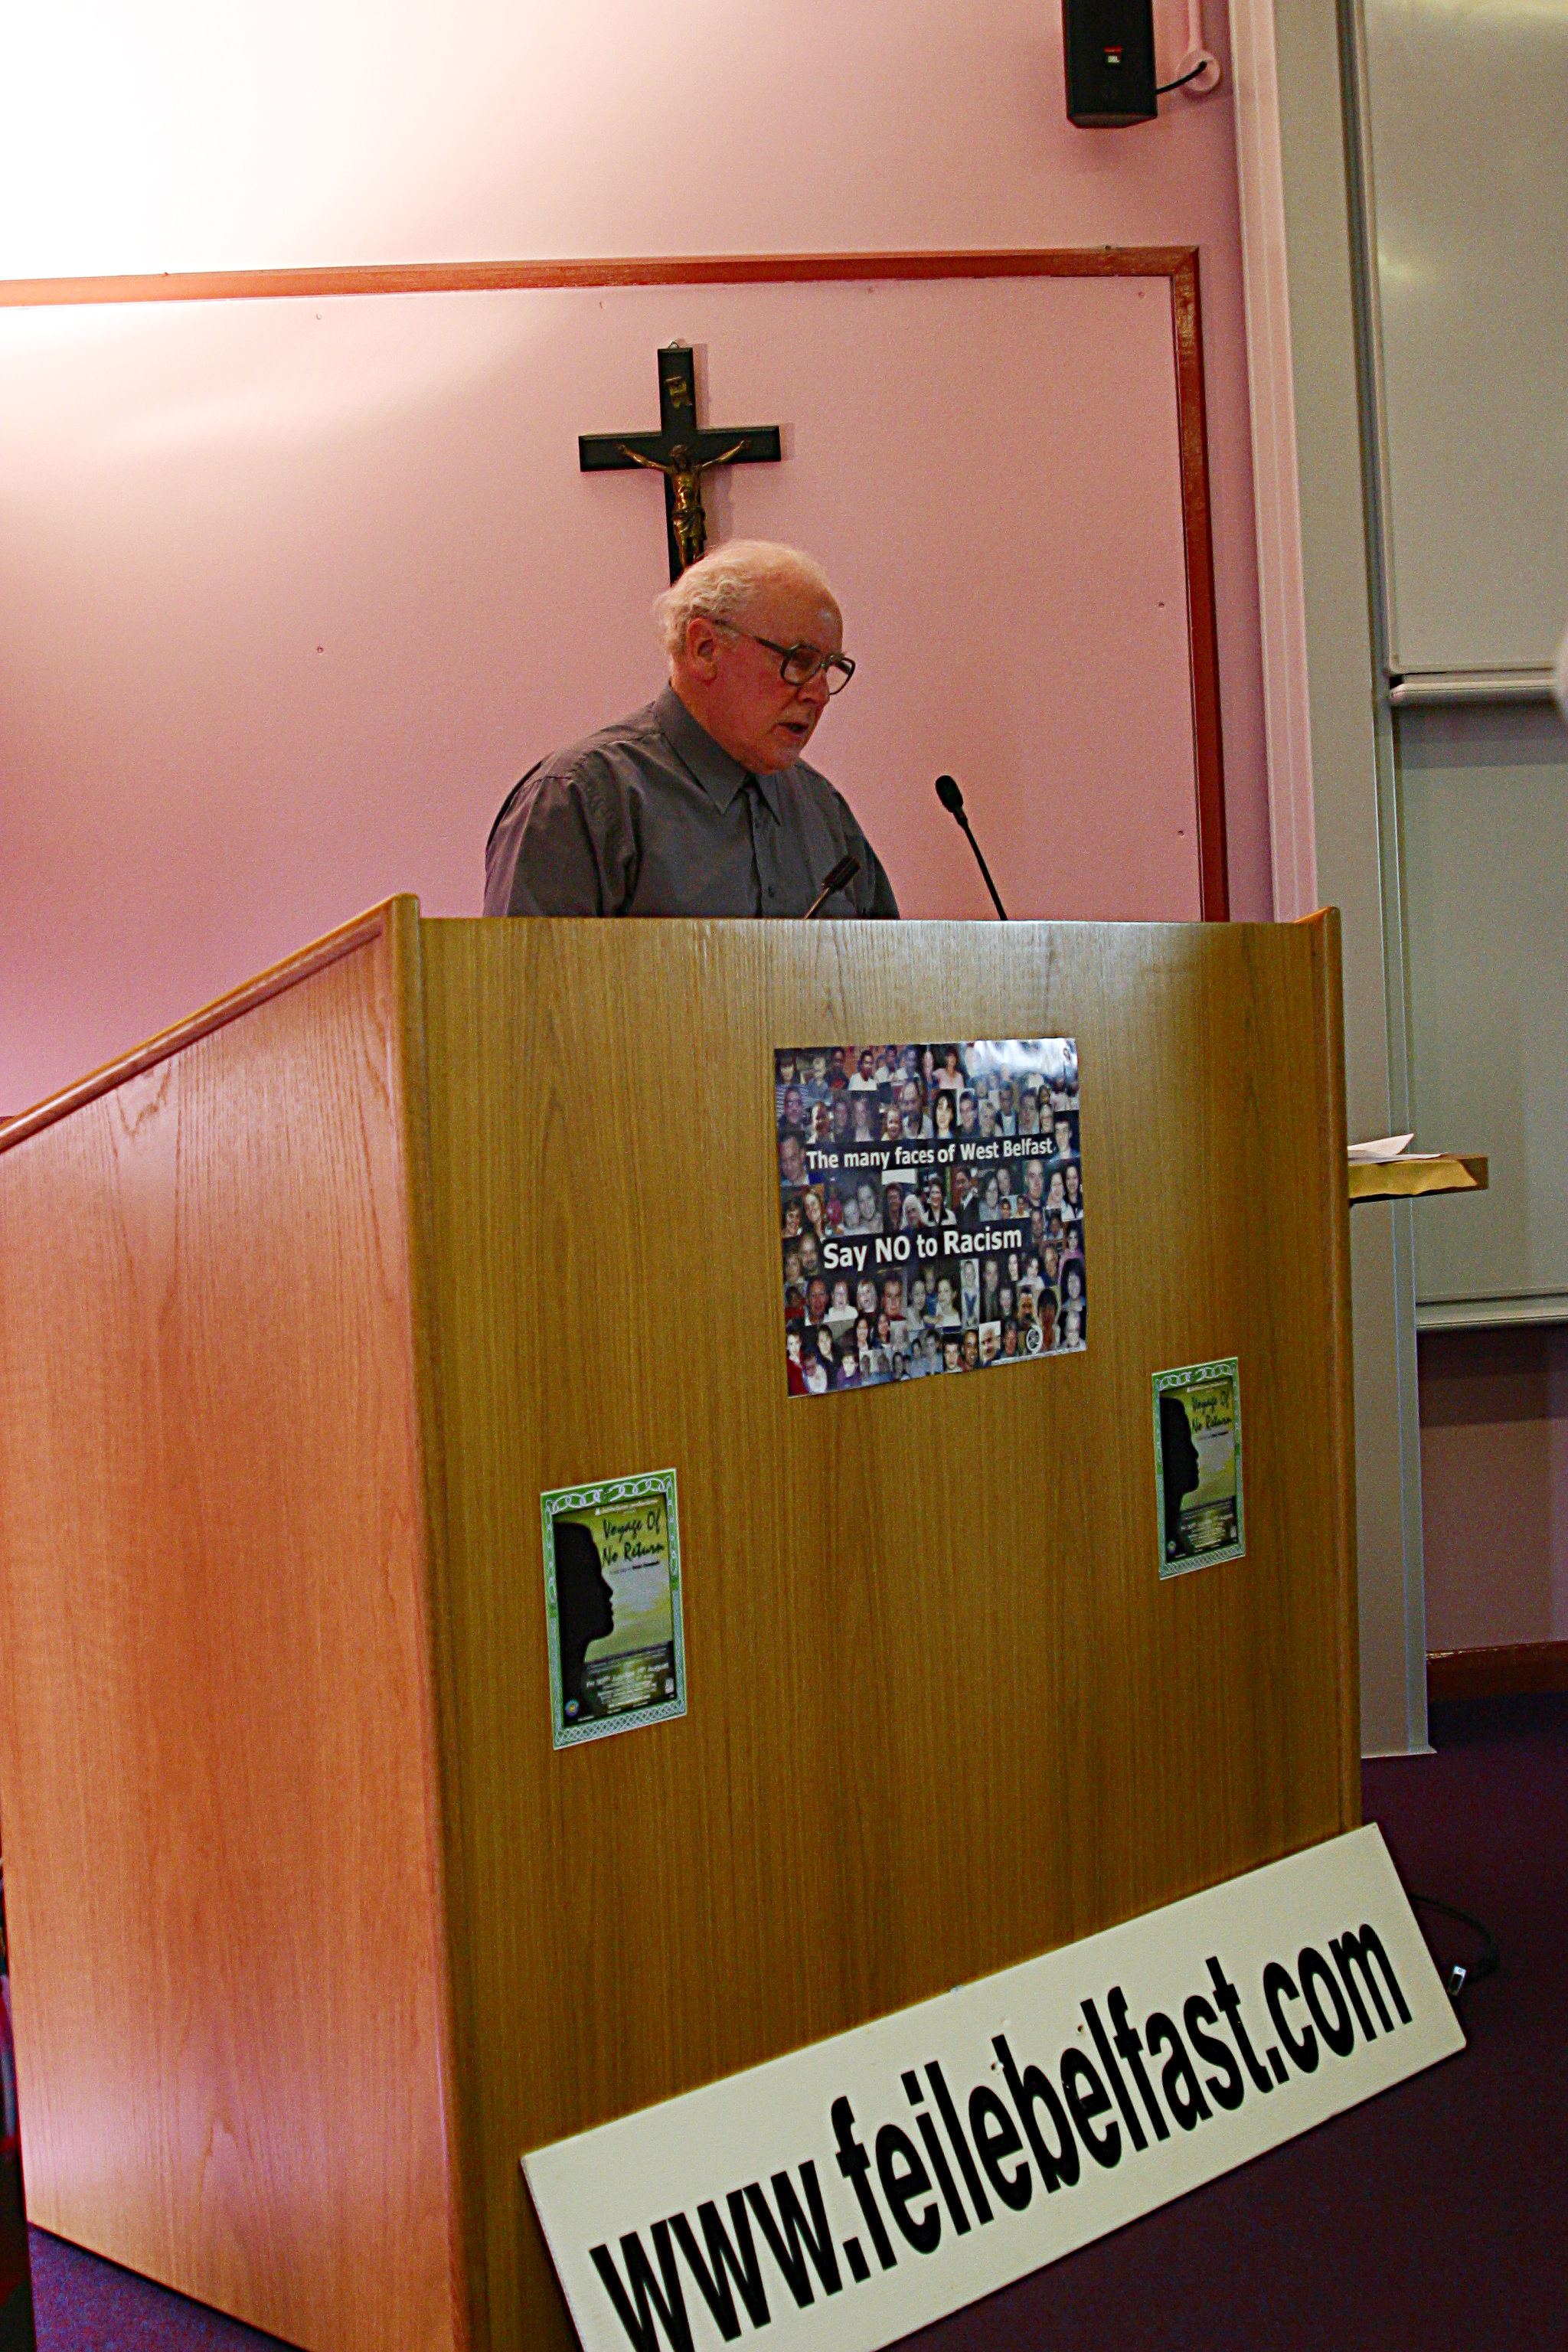 fr-des-wilson-speaking-at-warns-feile-event-july-2004